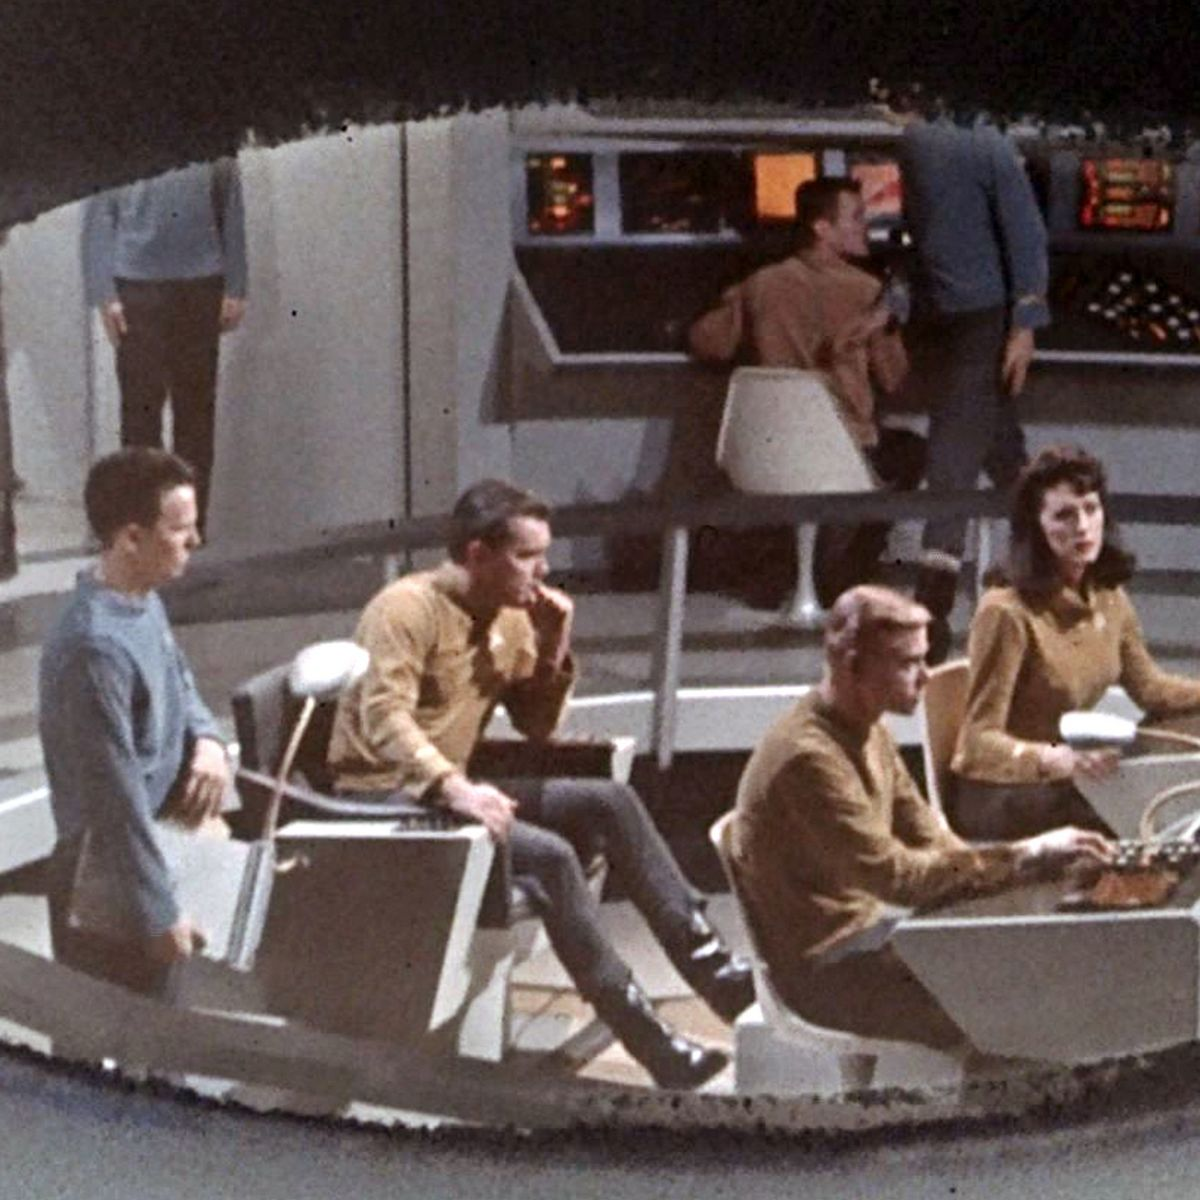 Gene Roddenberrys Original Pitch For Star Trek Syfy Wire Tendencies Caps Savage Navy